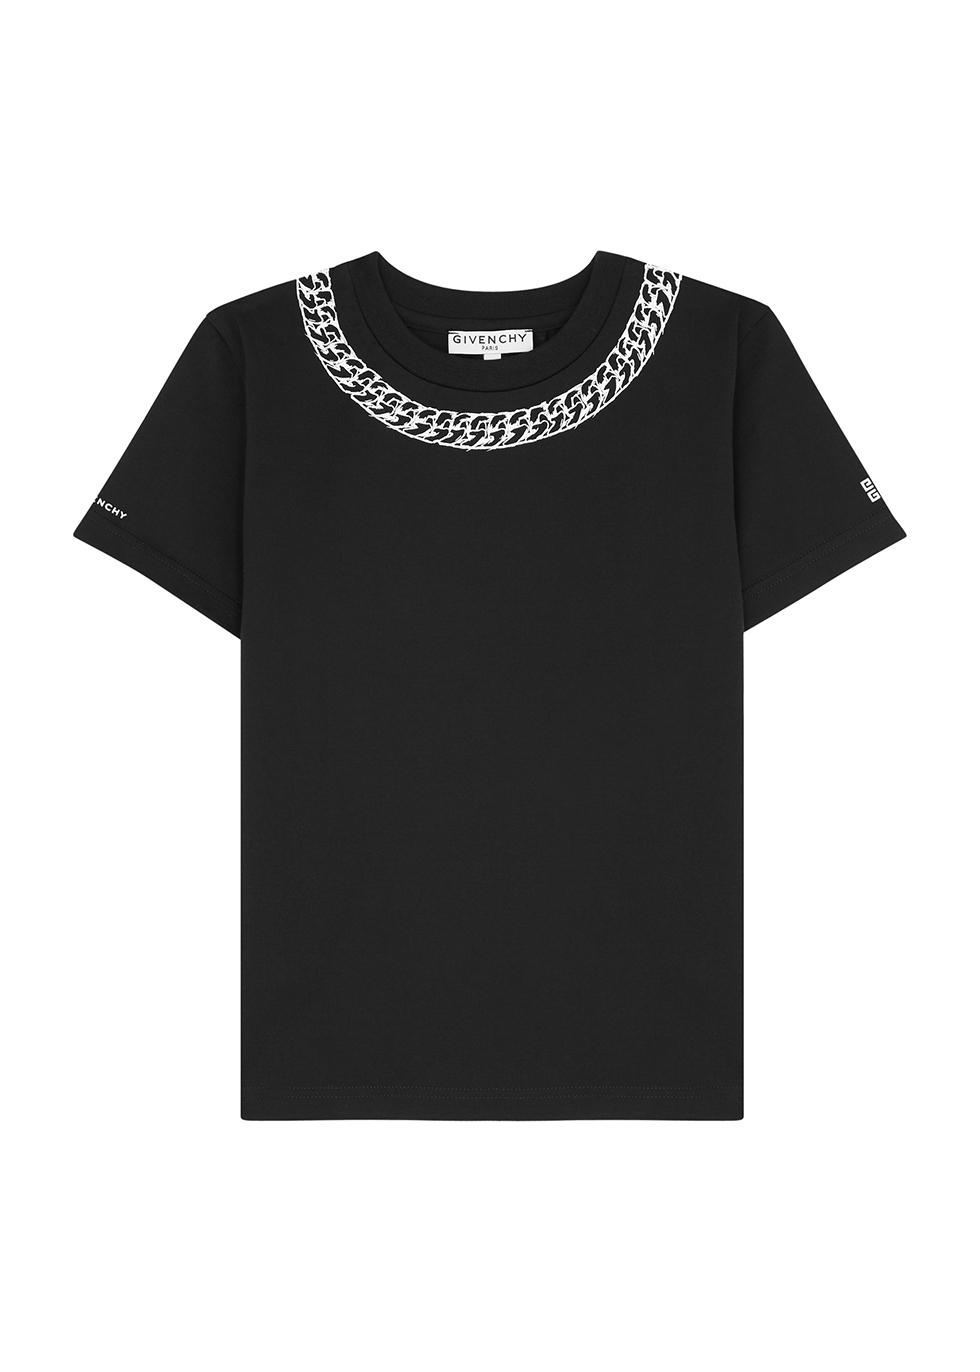 Black chain-print cotton T-shirt (4-5 years)